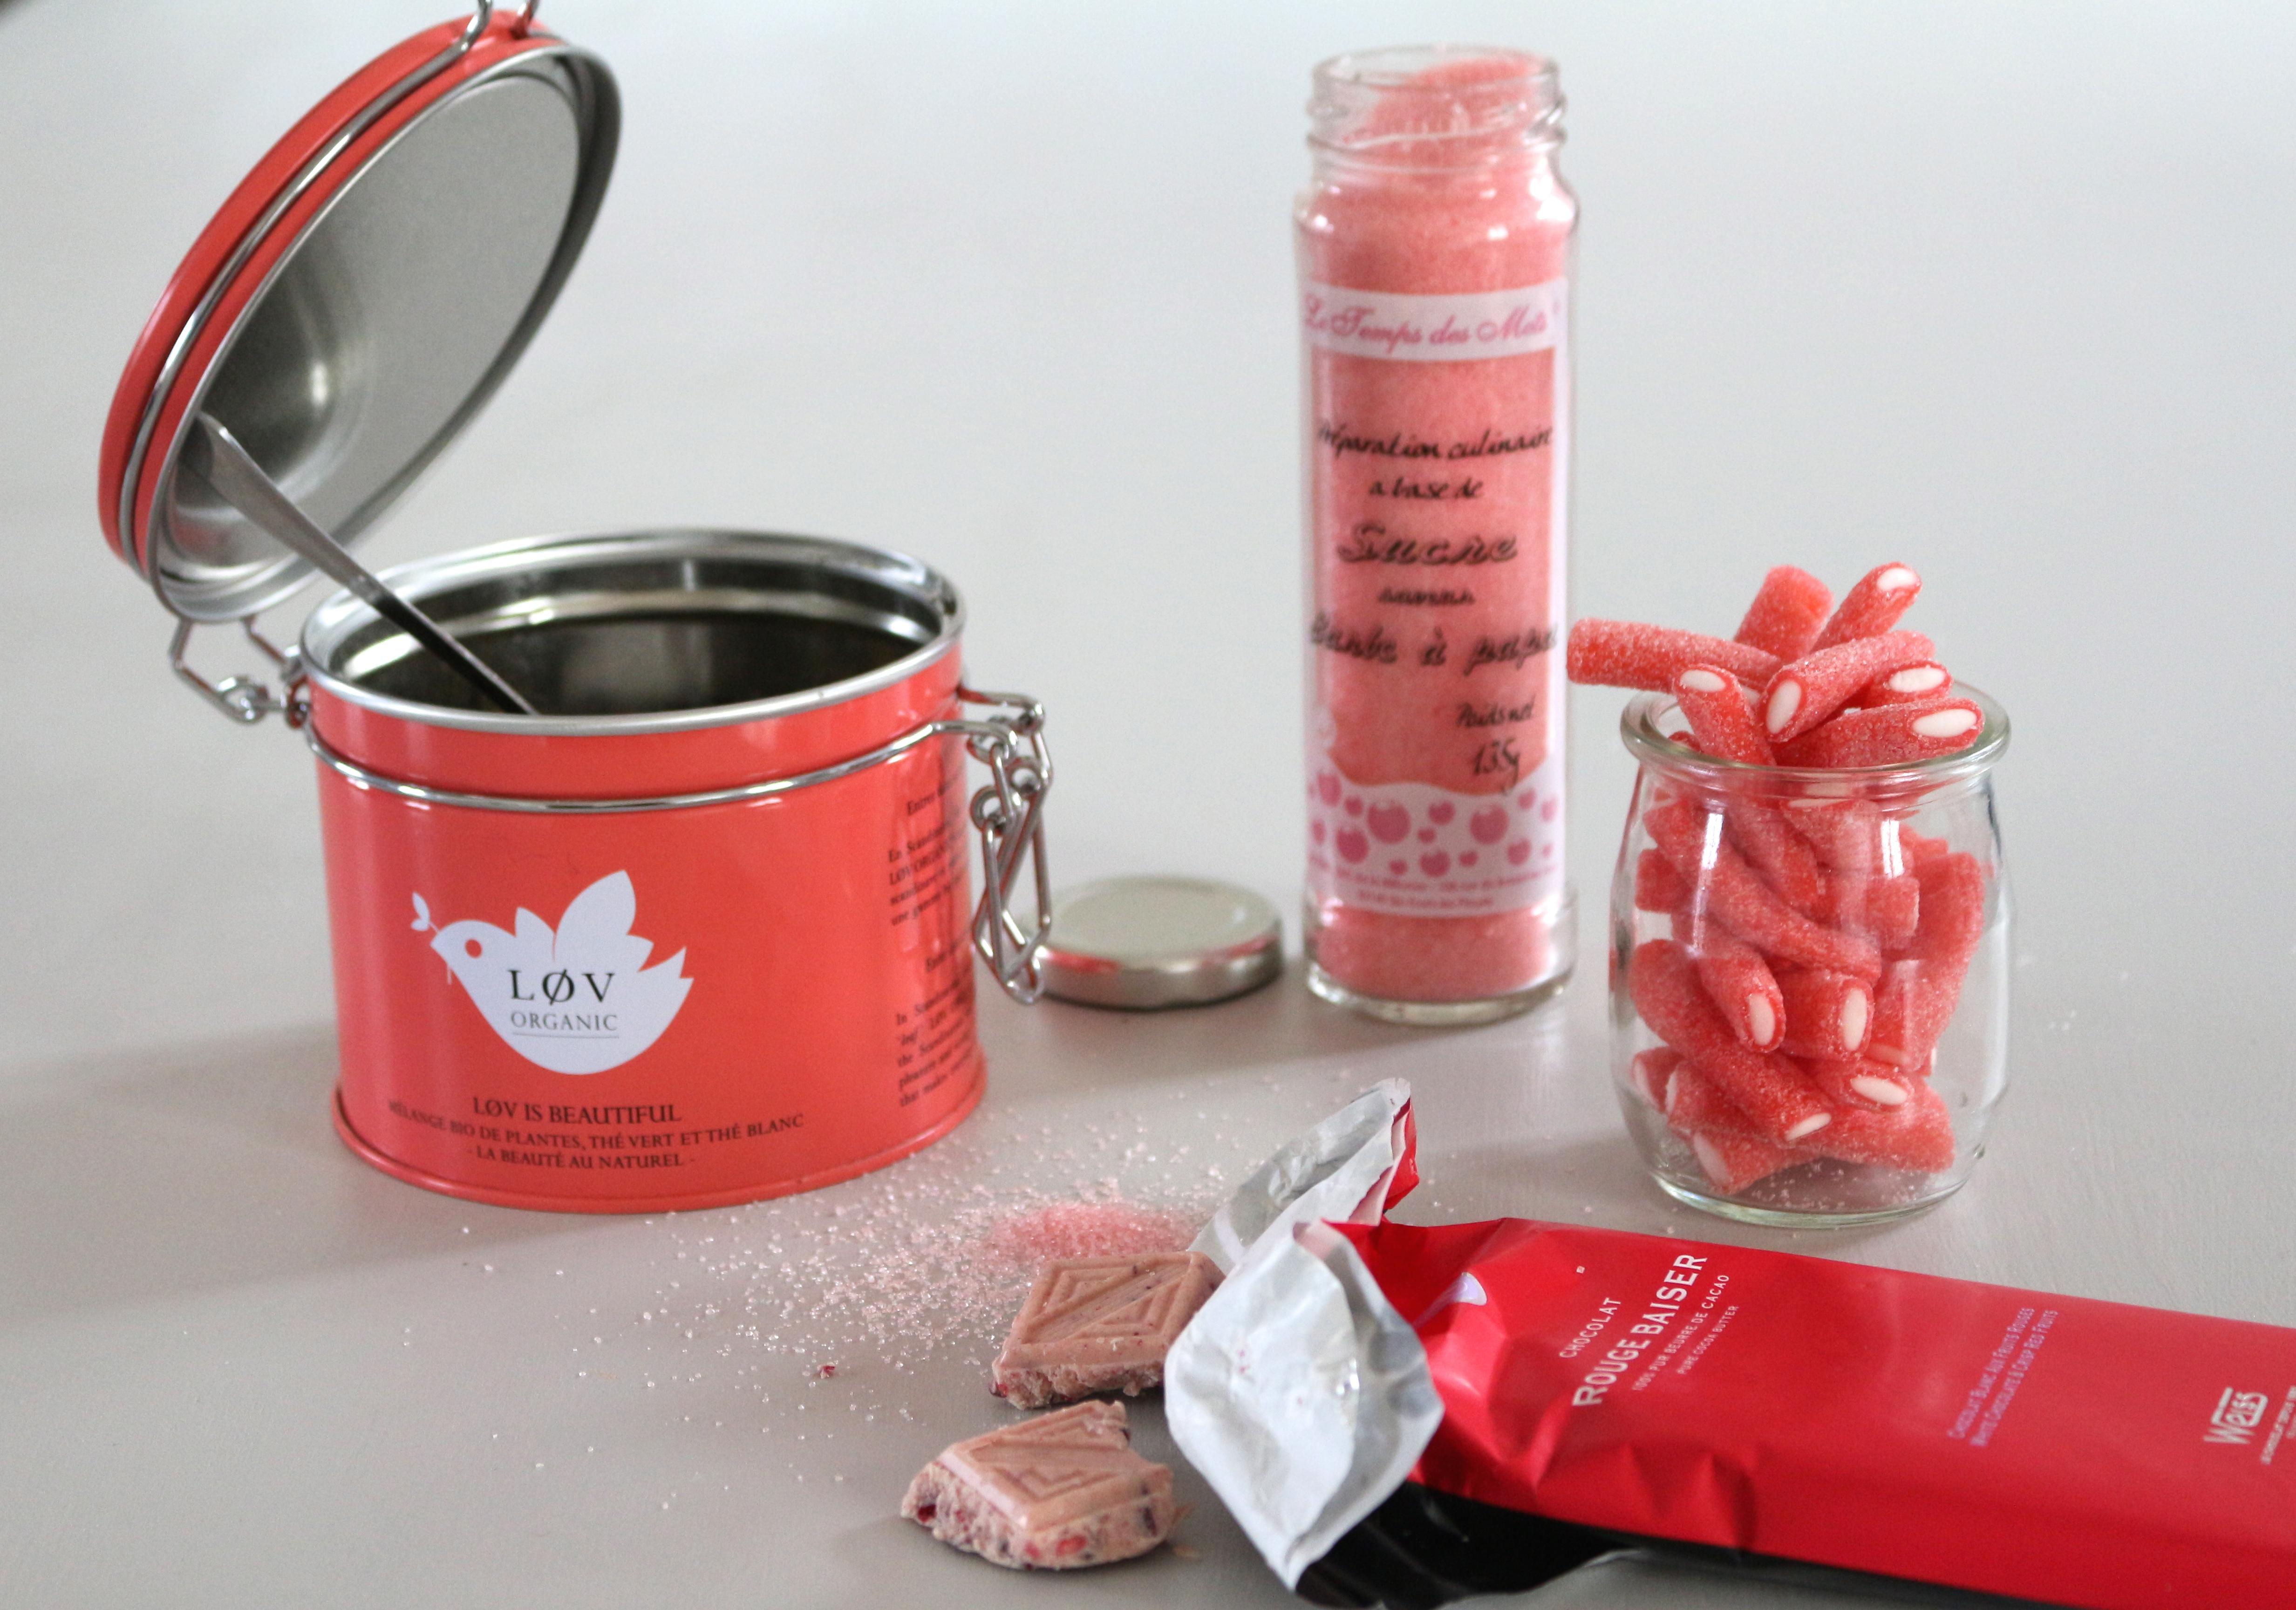 gourmandises : thé Lov, chocolat Weiss, bonbons Lutti